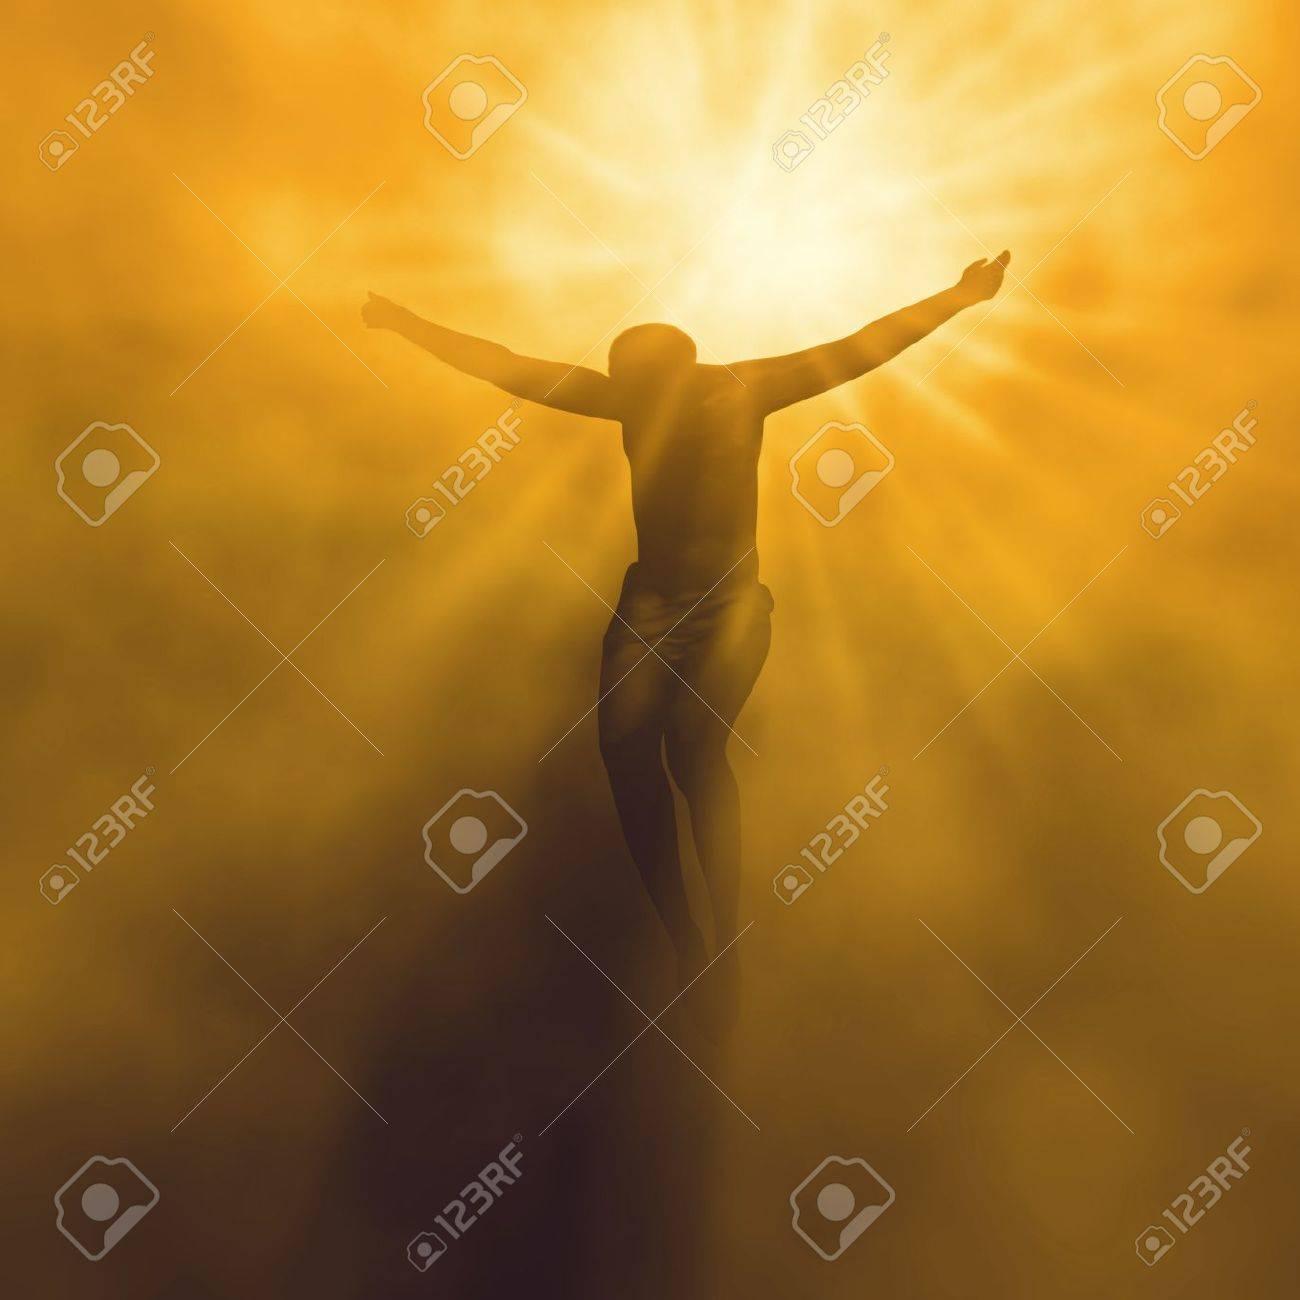 Jesus christ in heaven Stock Photo - 11545447